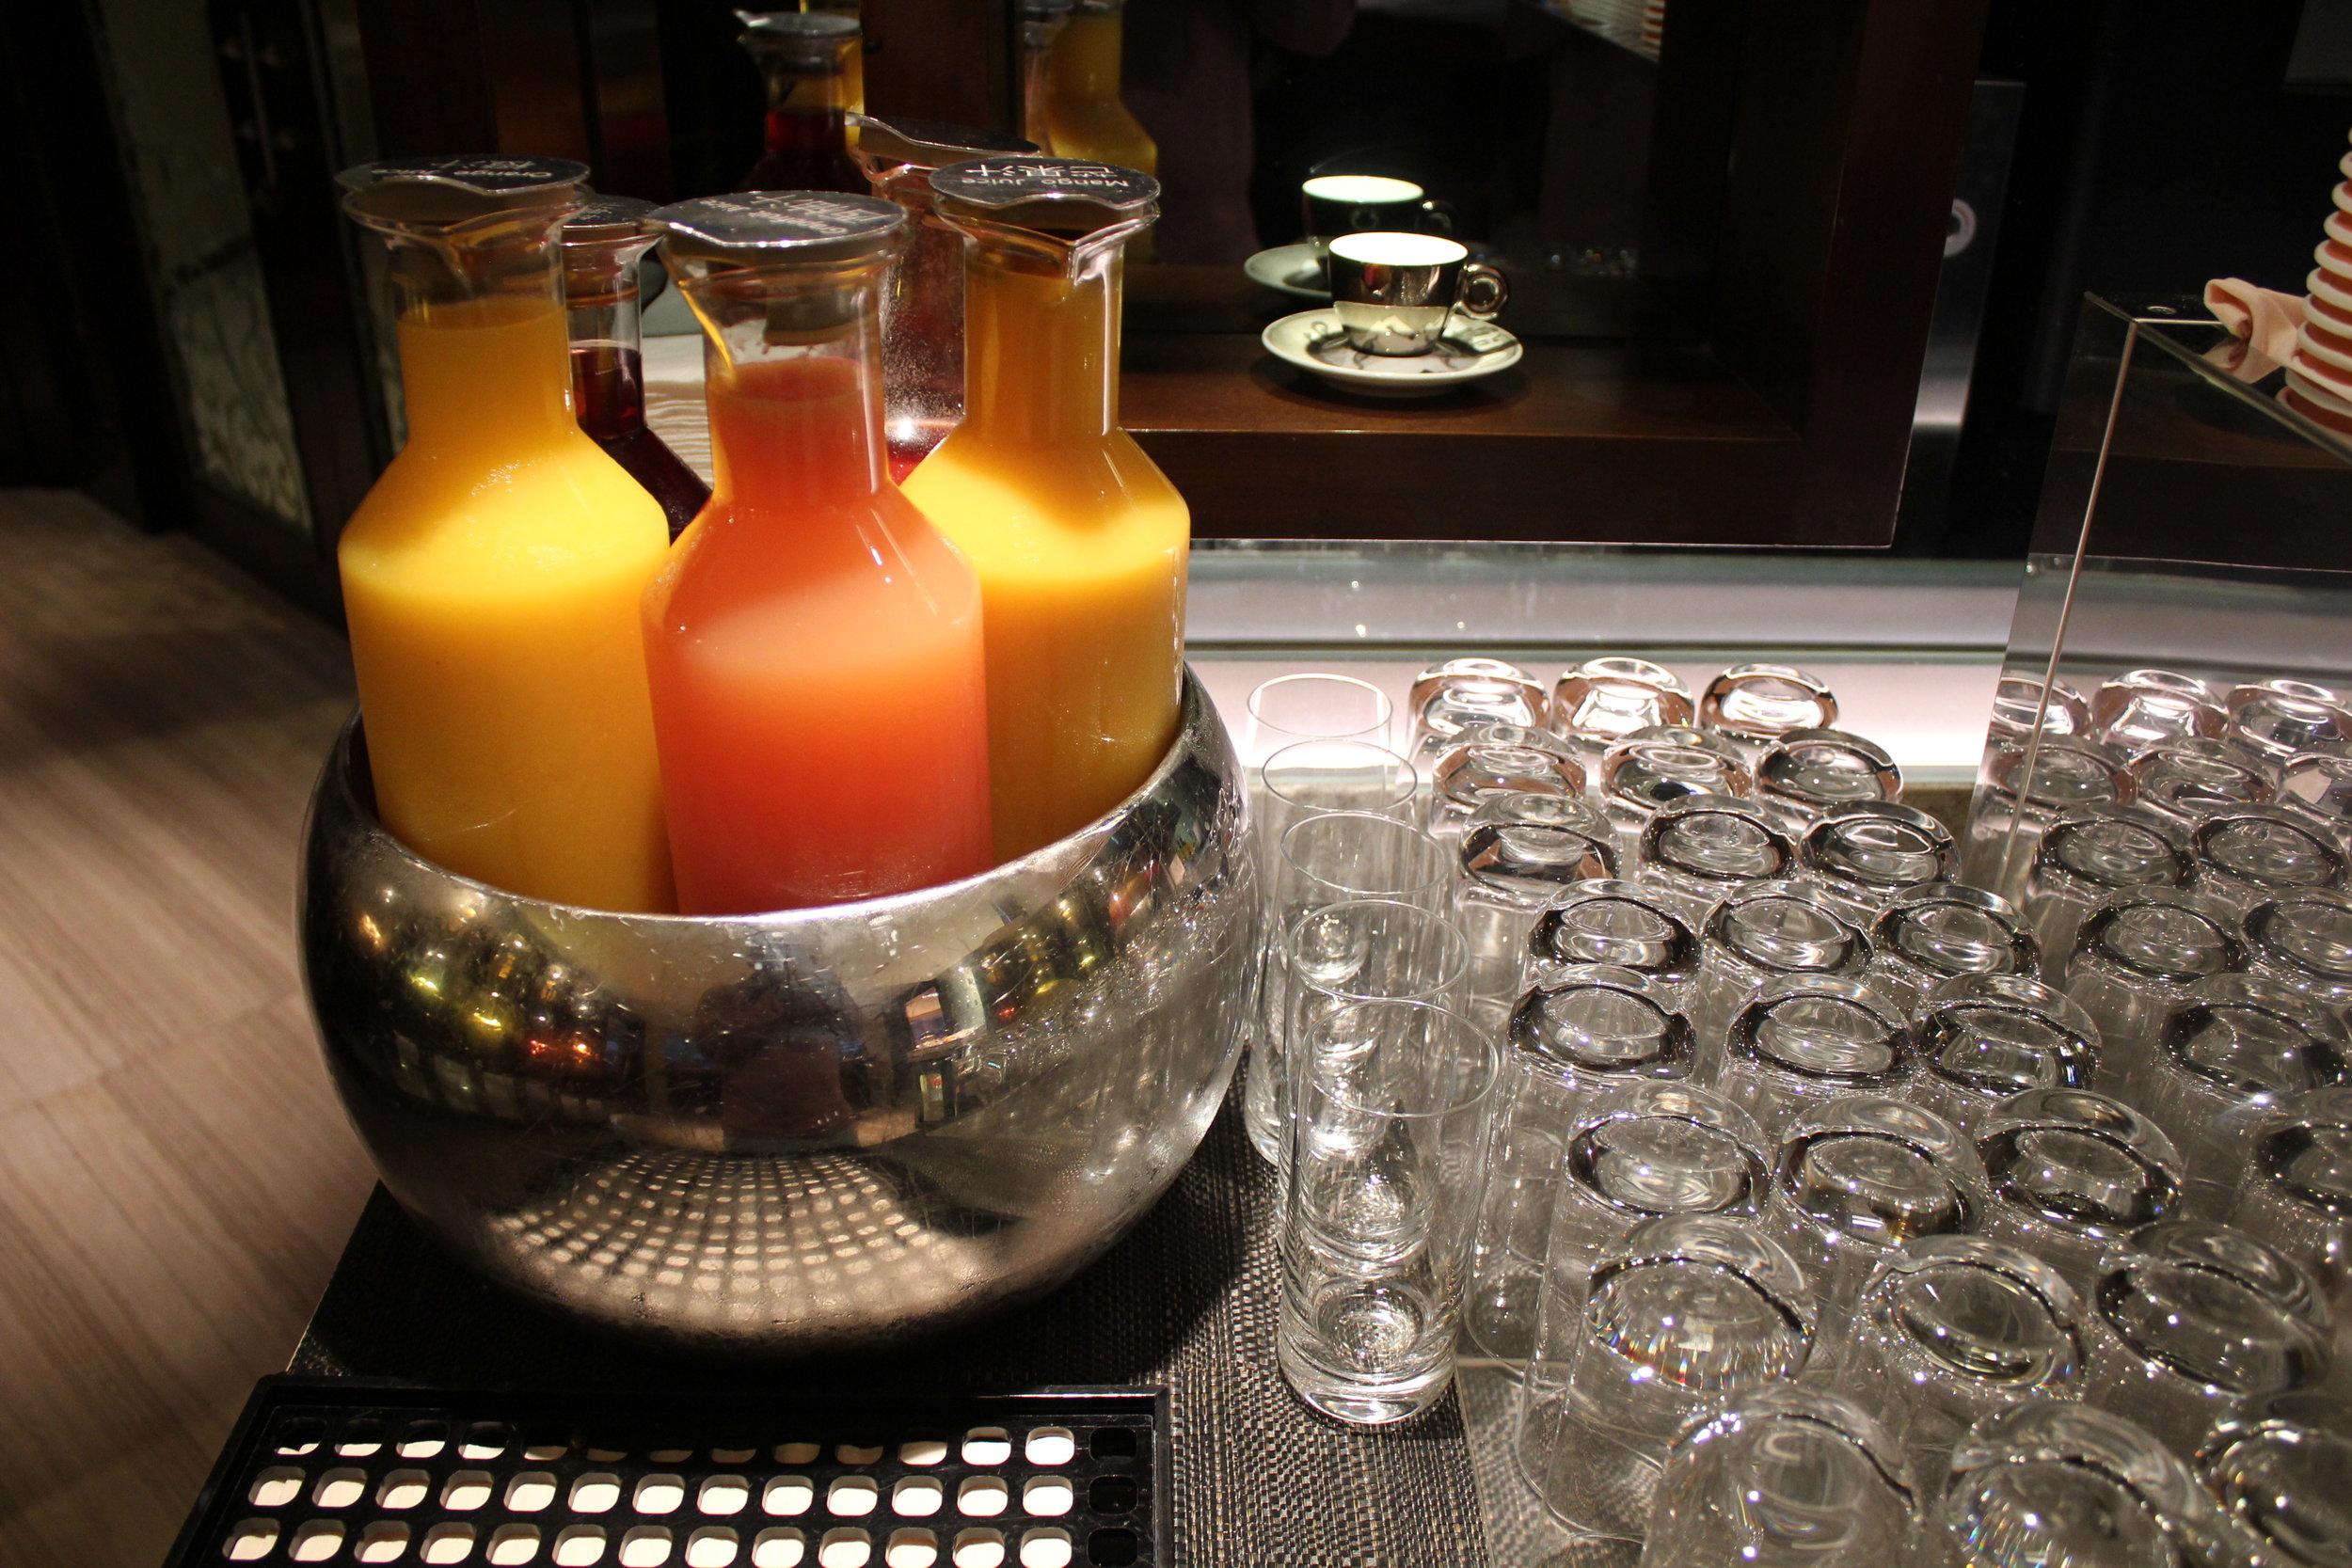 JW Marriott Hong Kong – Executive Lounge breakfast spread